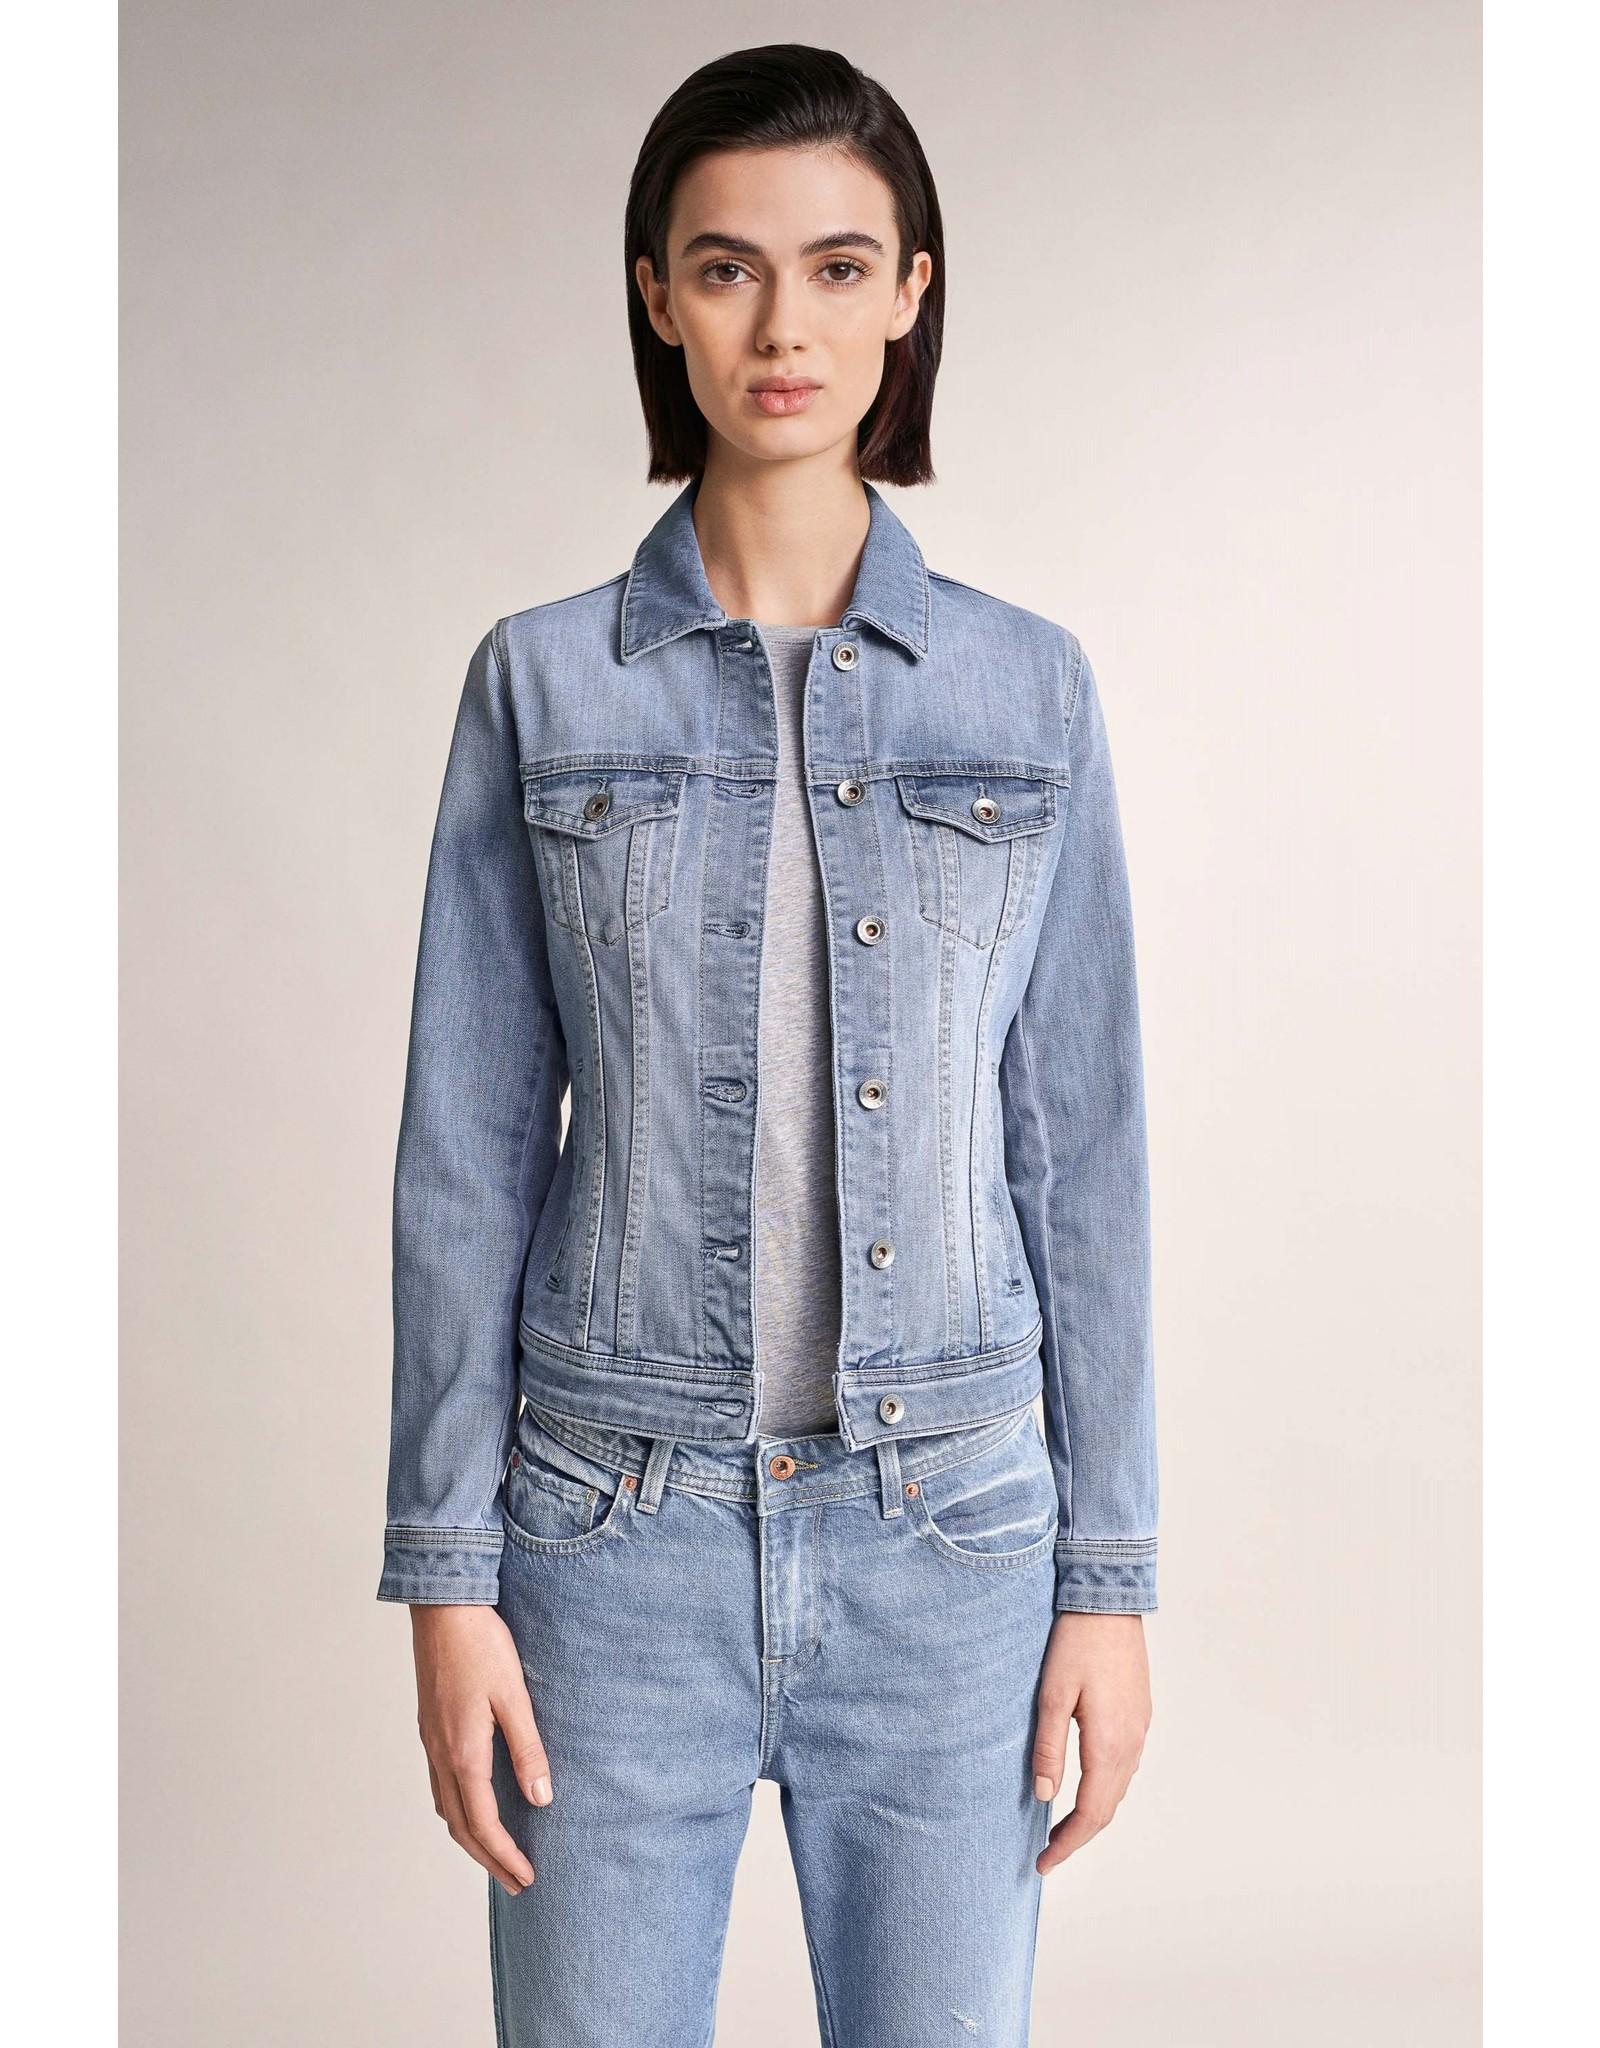 Salsa Jeans Denim Jacket